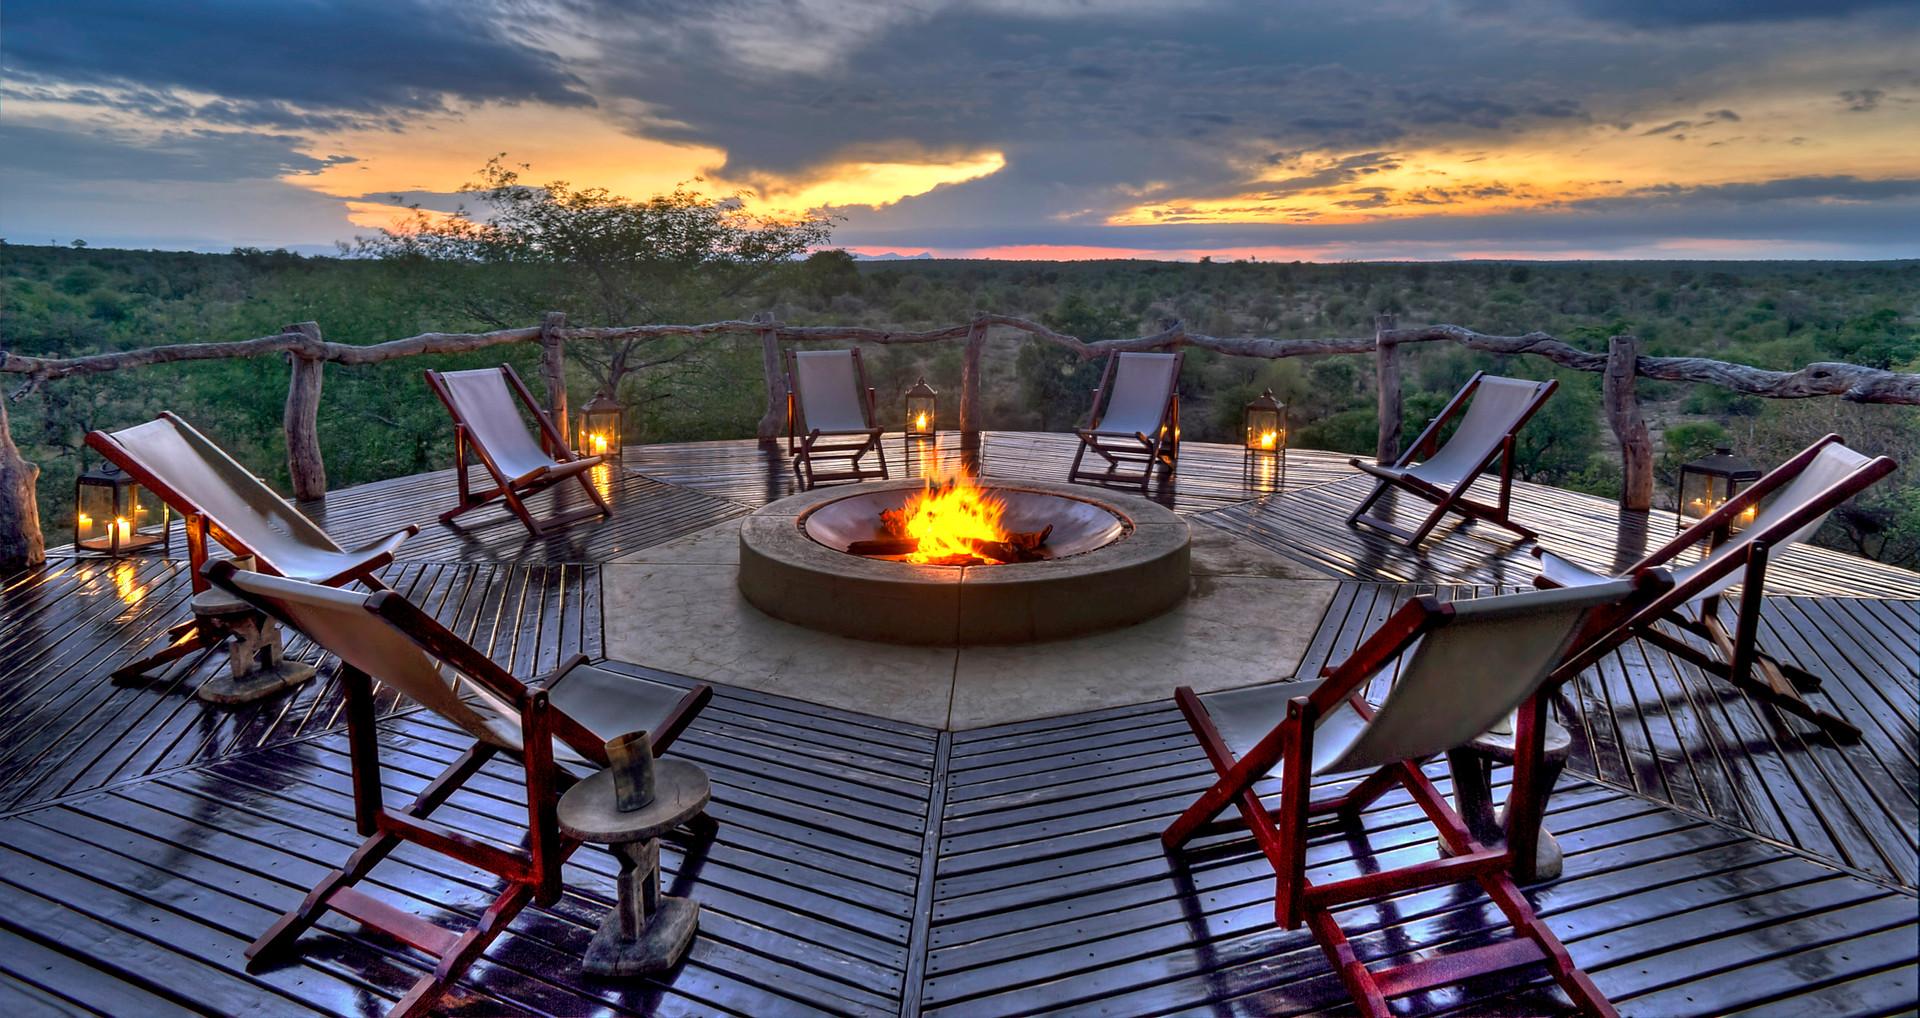 Boma at Makumu Game Lodge, Kruger National Park